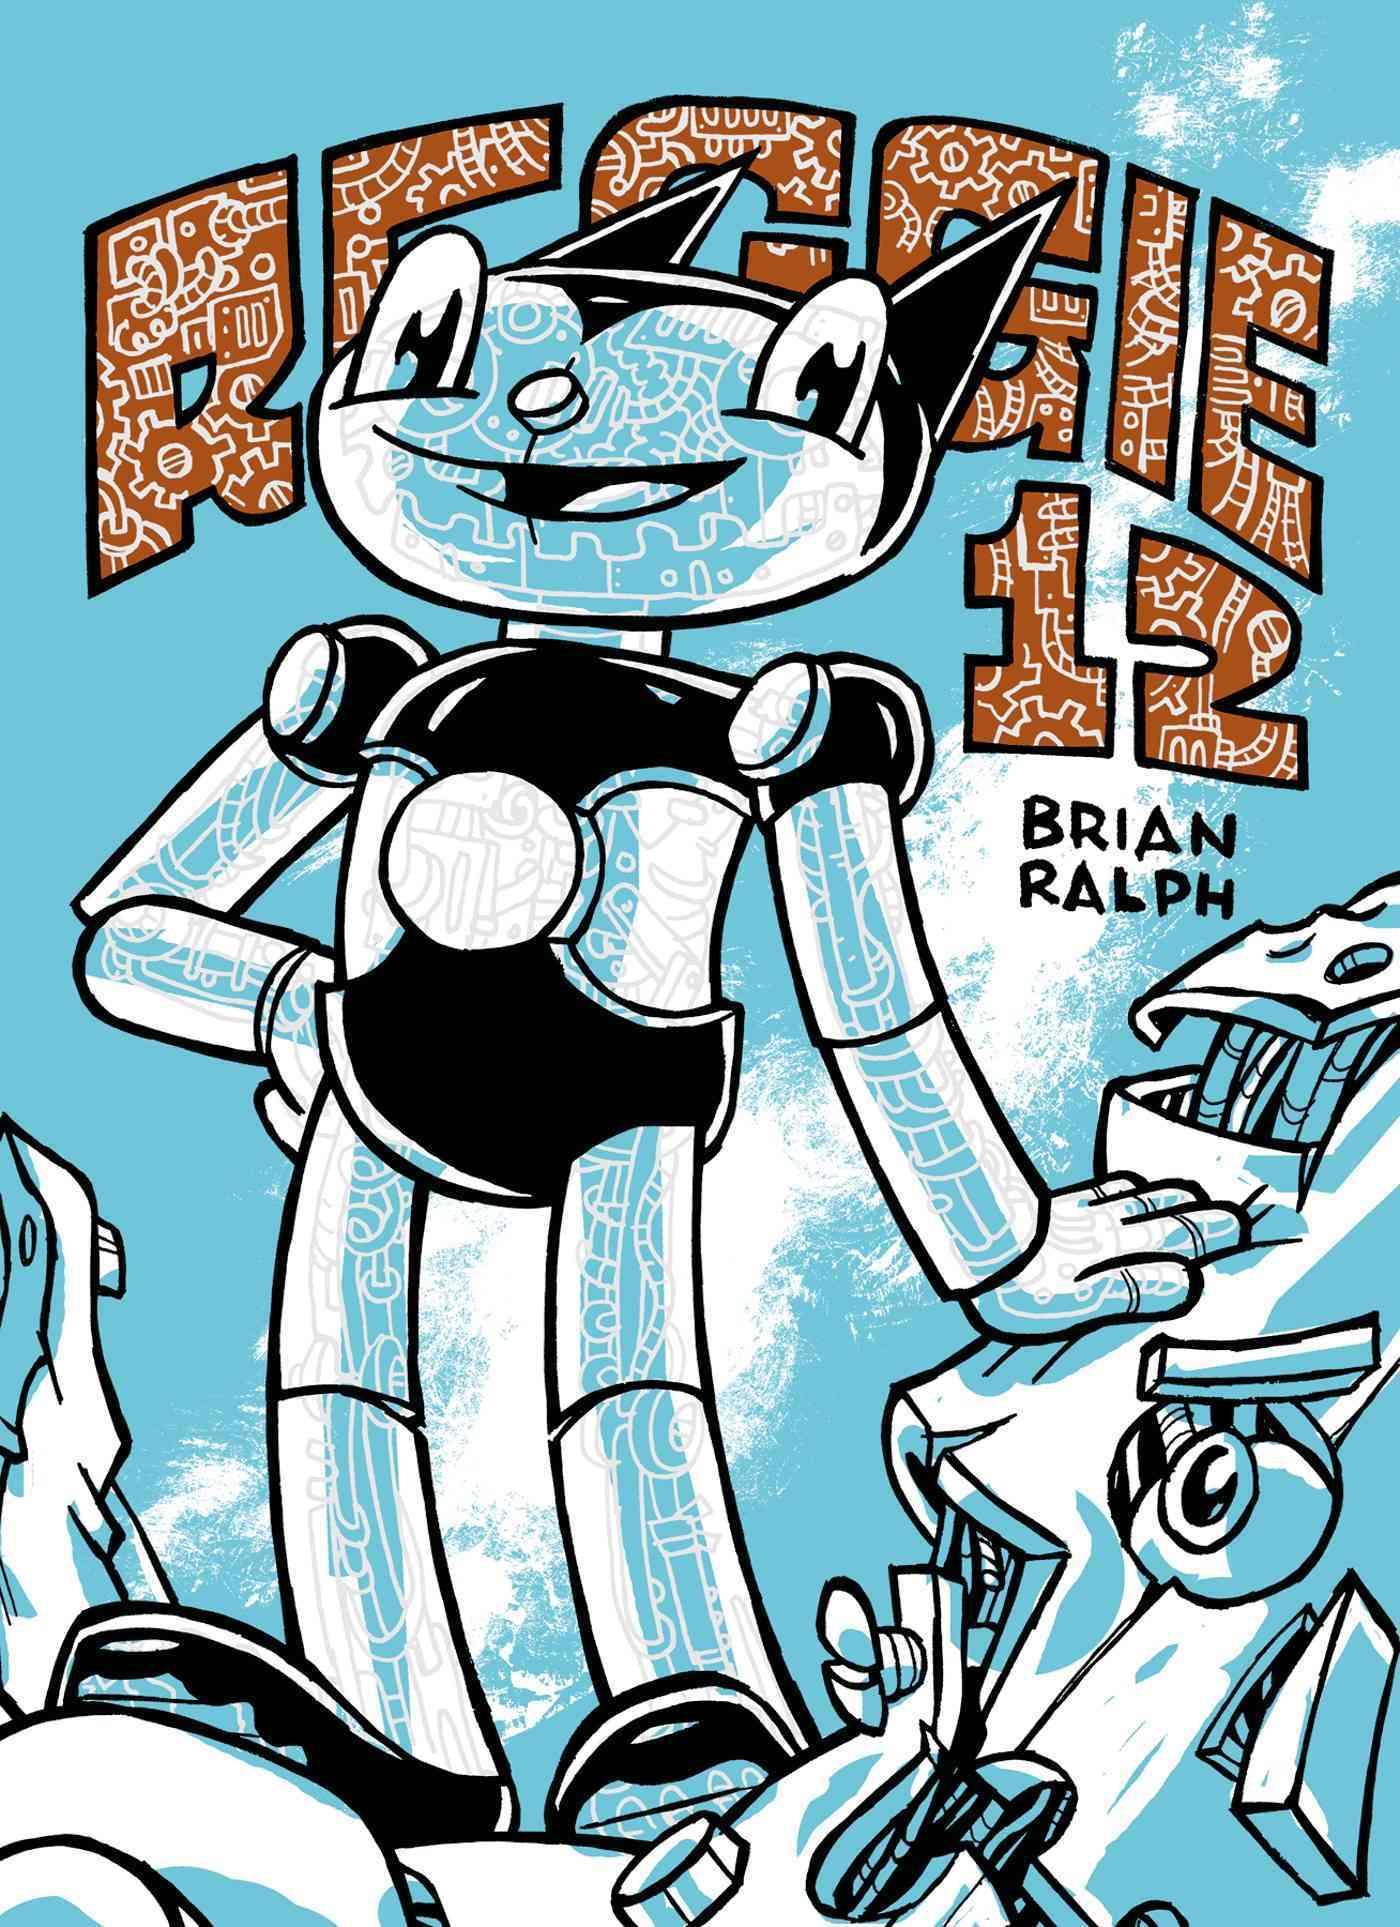 Reggie-12 By Ralph, Brian